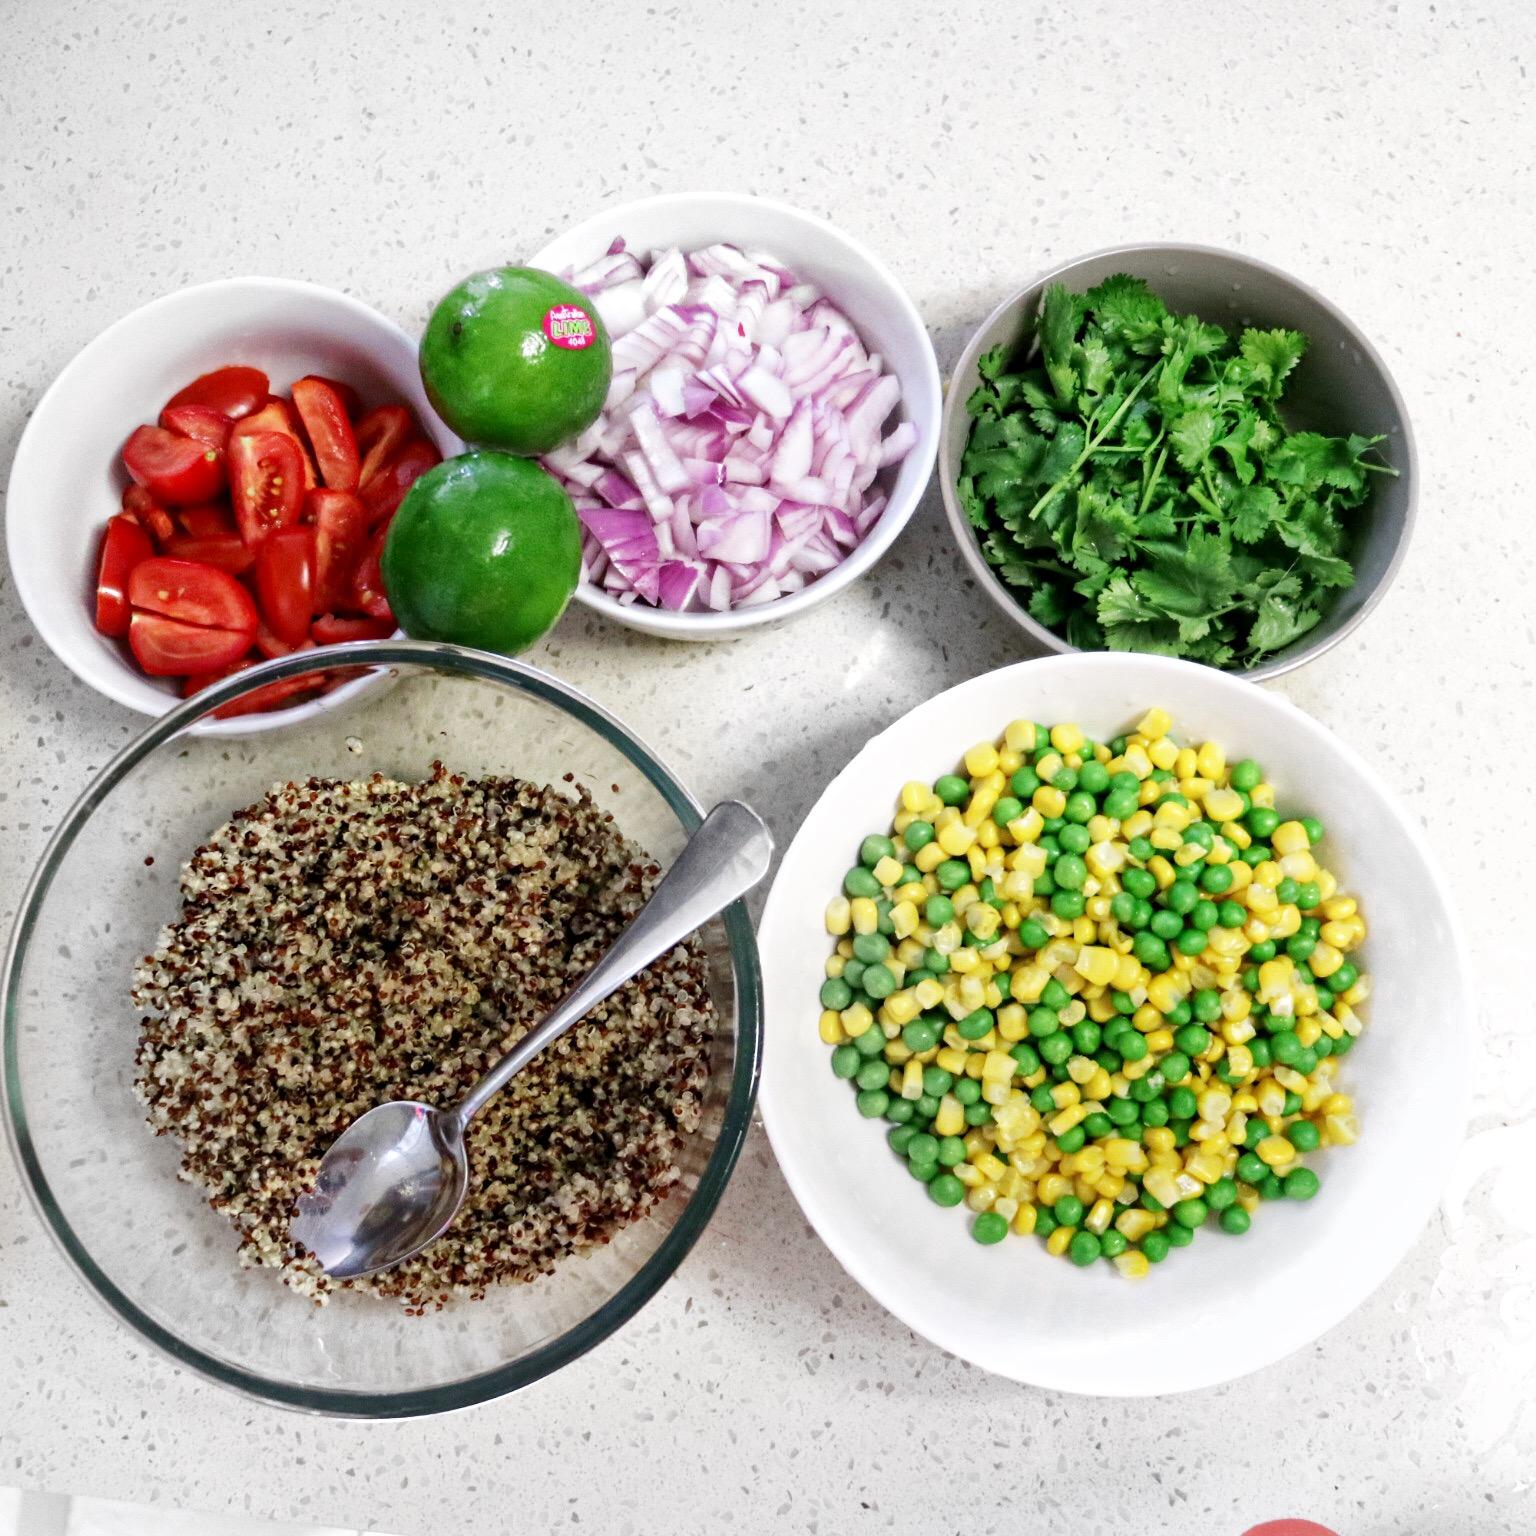 Meal-Prep_Chicken-Mexican-Salad3.jpg